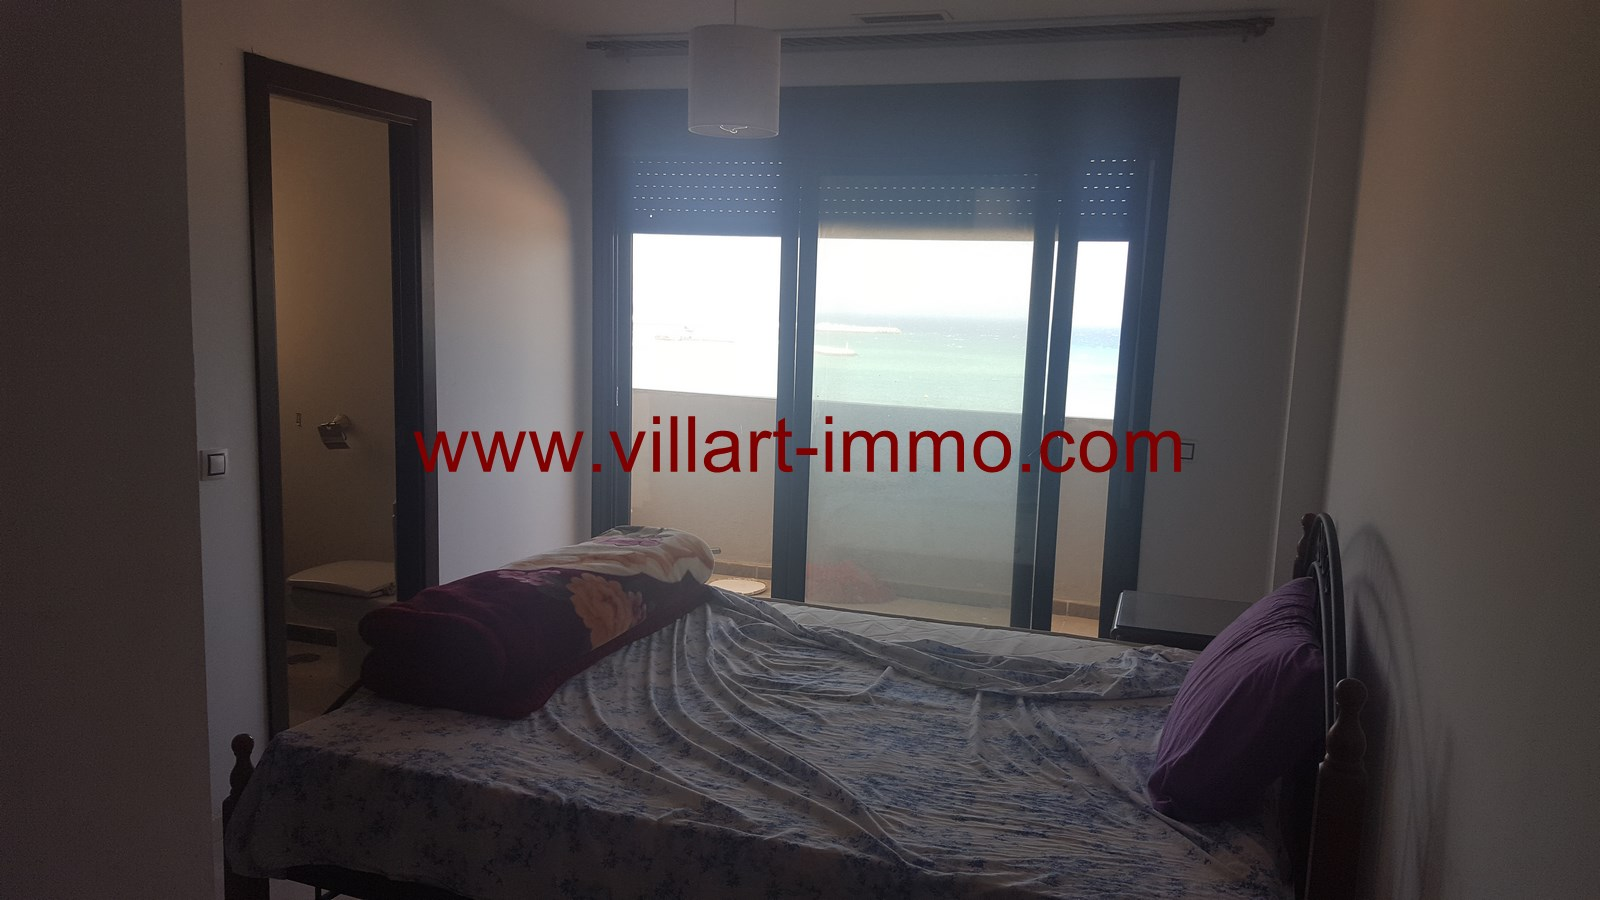 5-a-vendre-appartement-tanger-quartier-playa-chambre-principale-va433-villart-immo